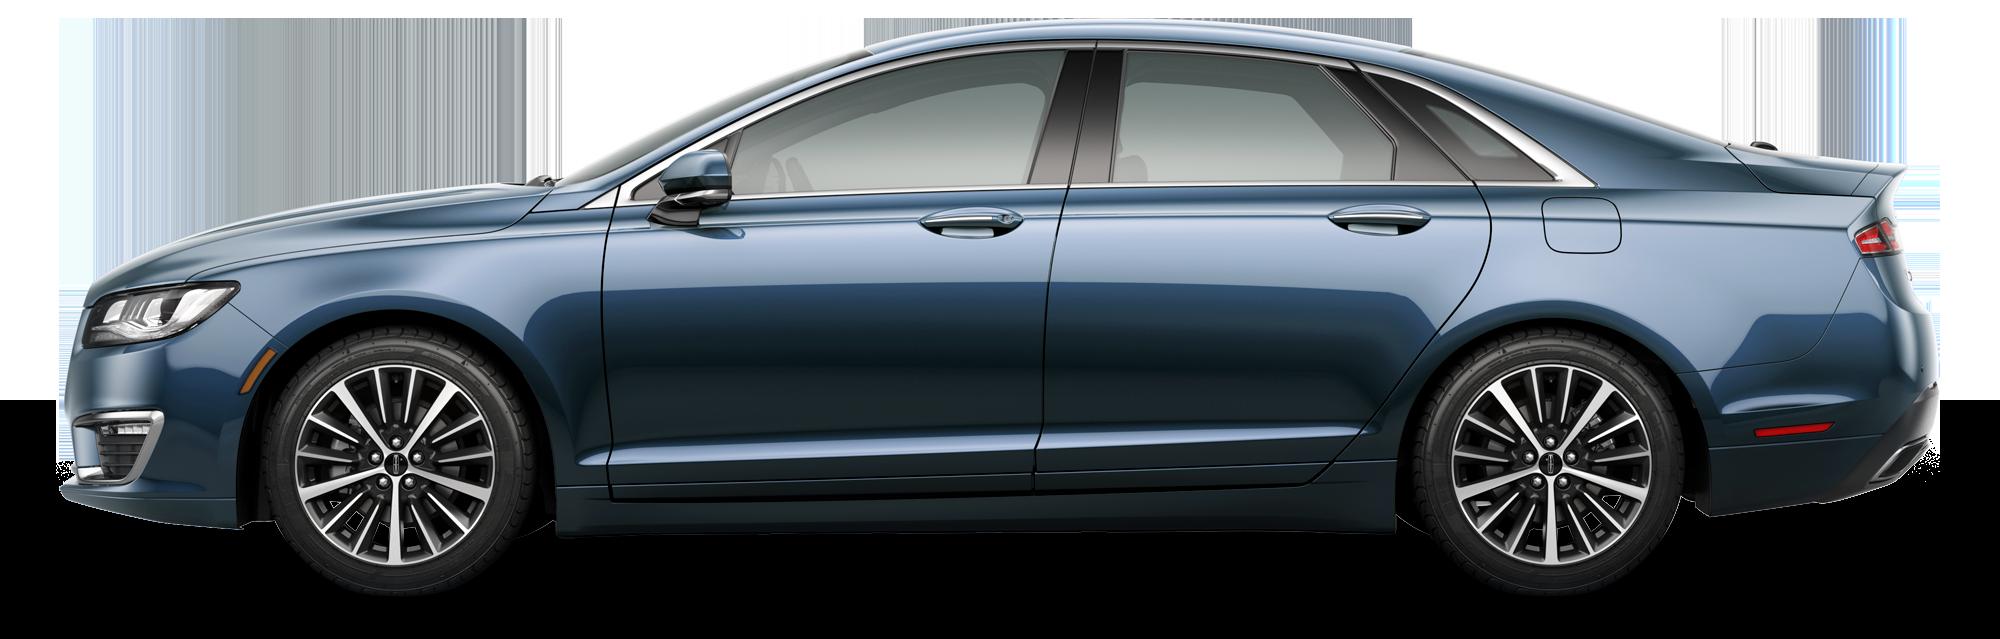 2019 Lincoln MKZ Sedan Standard